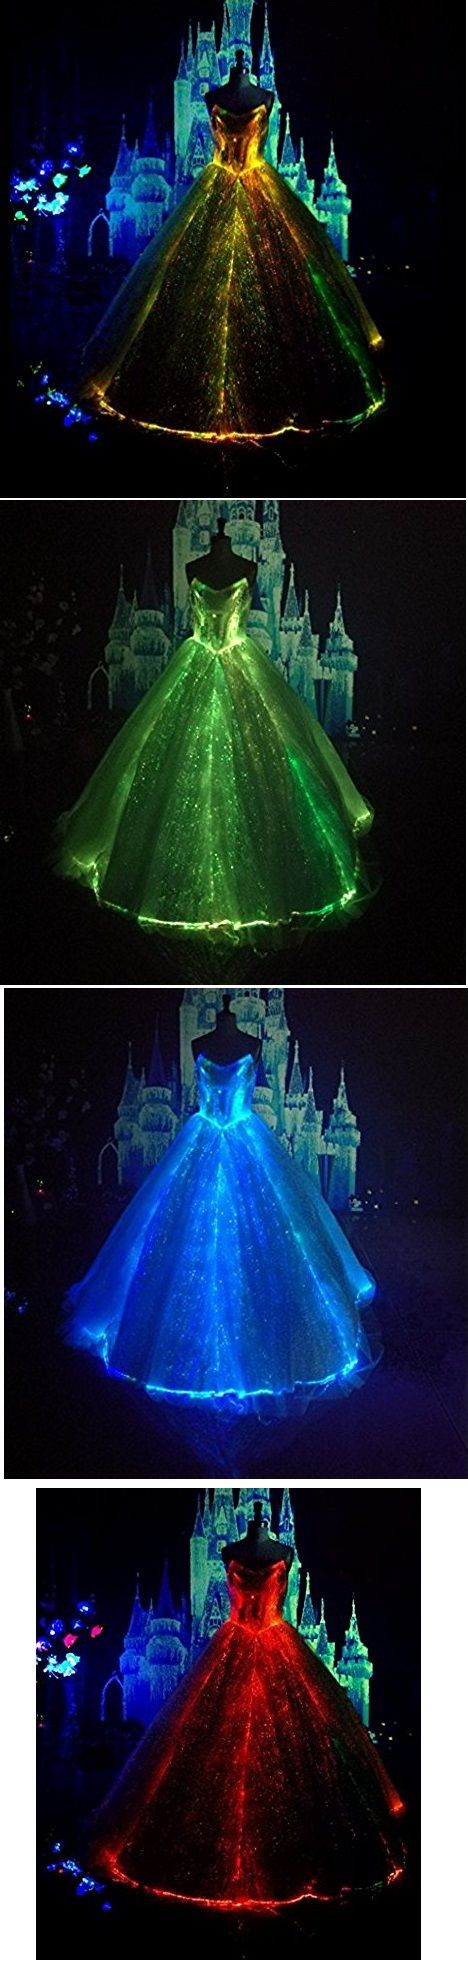 LED Wedding Dress | Craze Trend